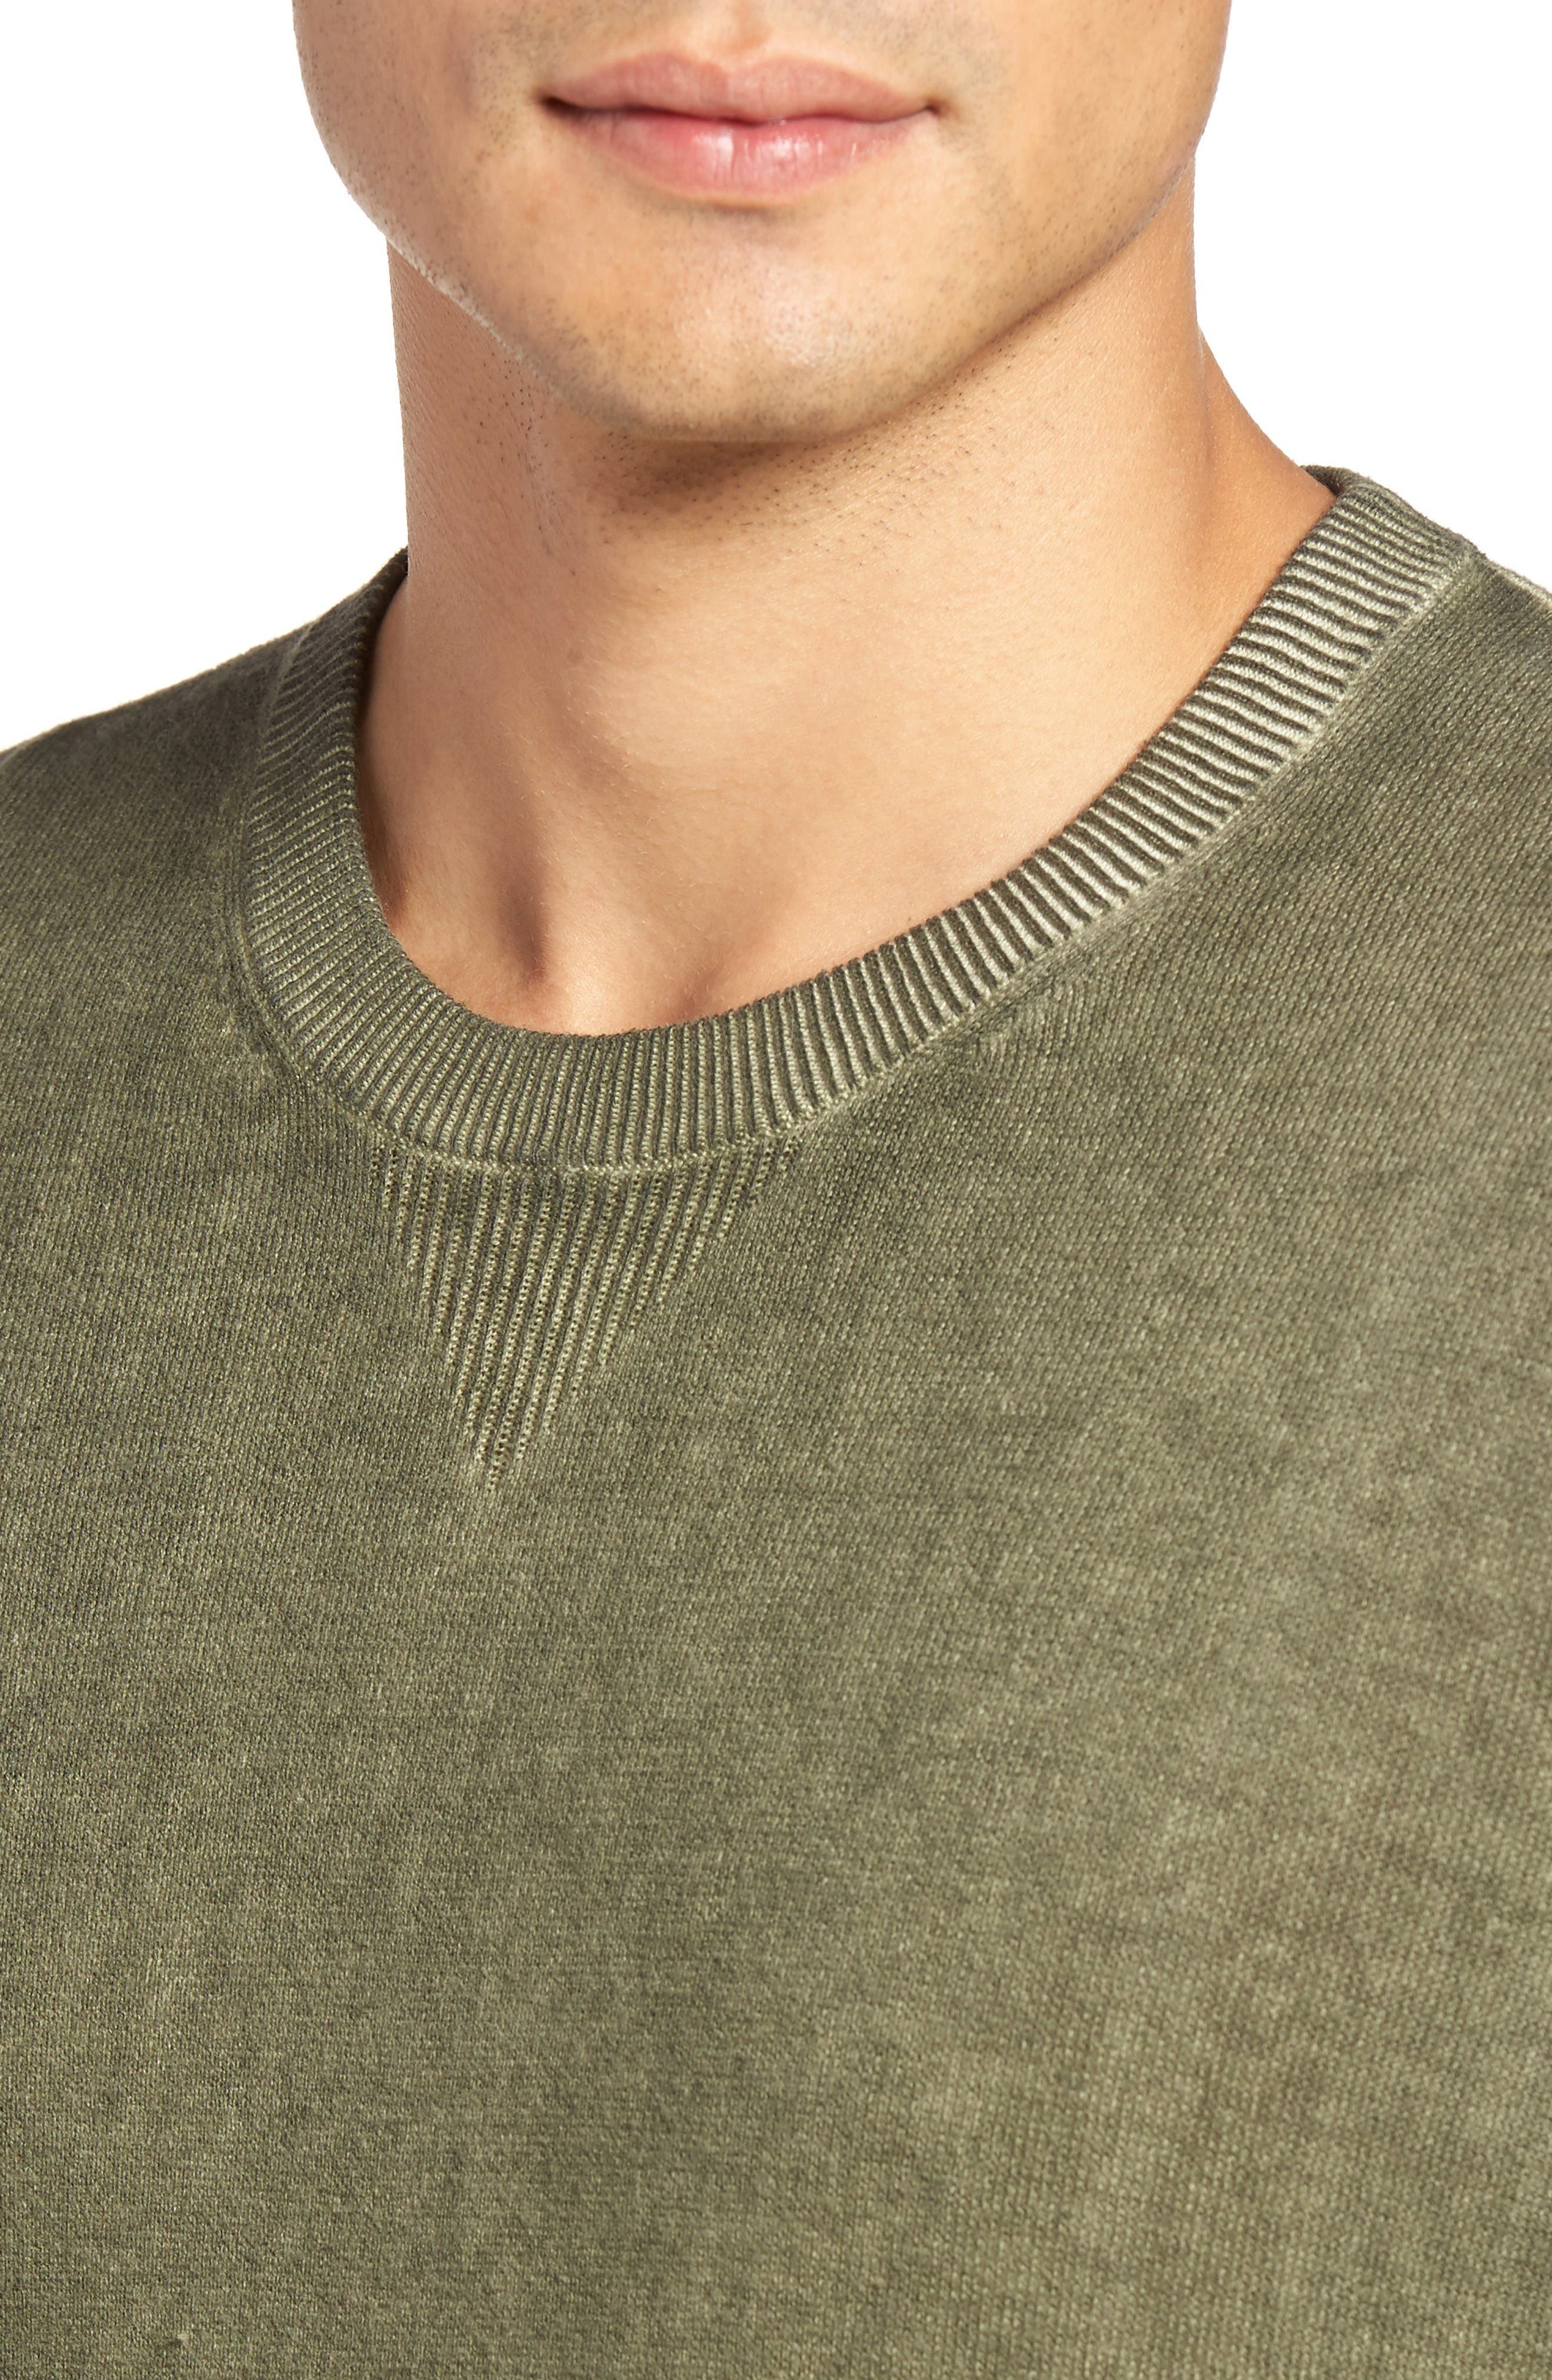 Mace Crewneck Sweater,                             Alternate thumbnail 4, color,                             Moonwash Caper Green